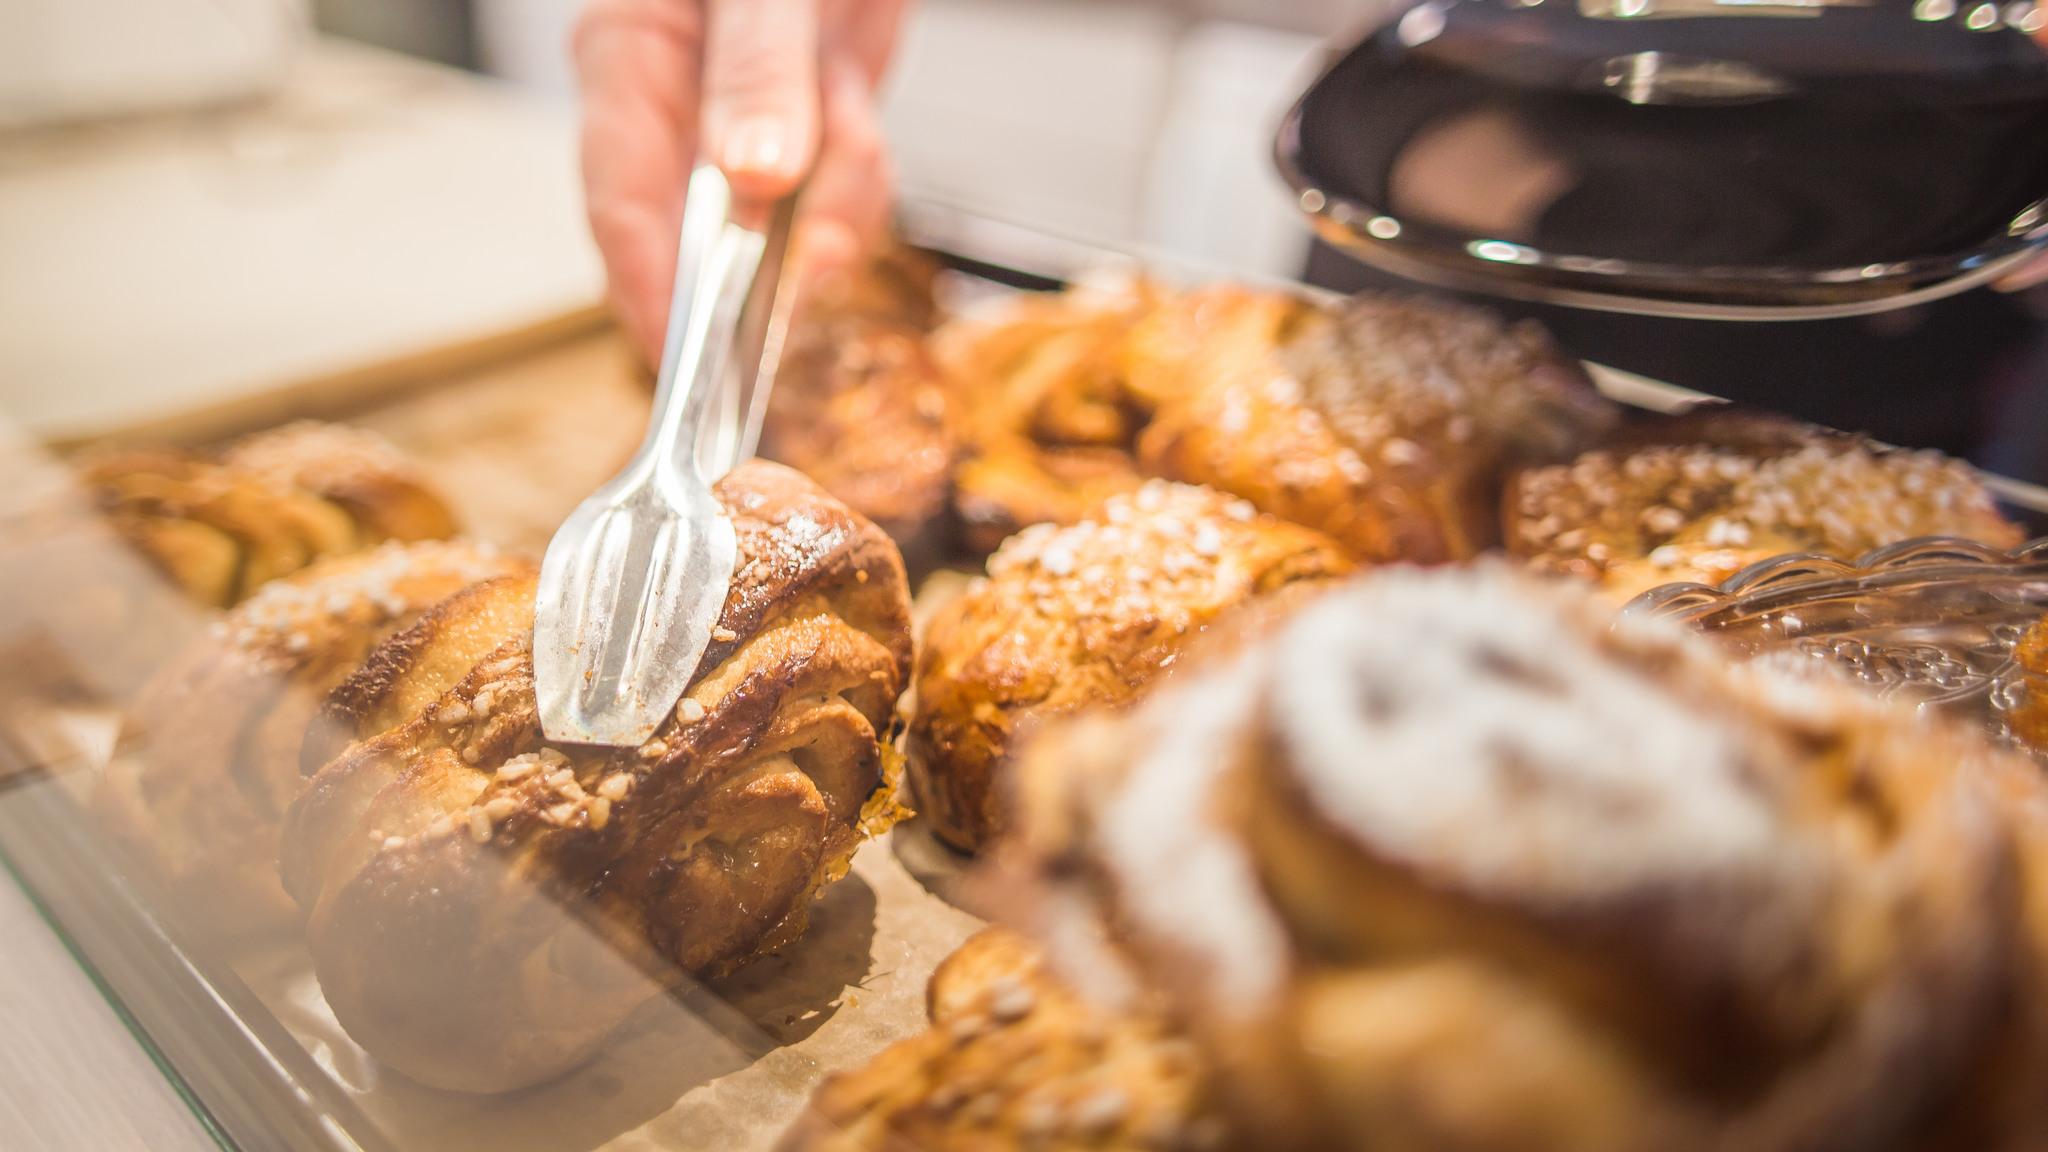 Visit_Tampere_Bakery_Café_Puusti_Kahvila_Laura_Vanzo.jpg